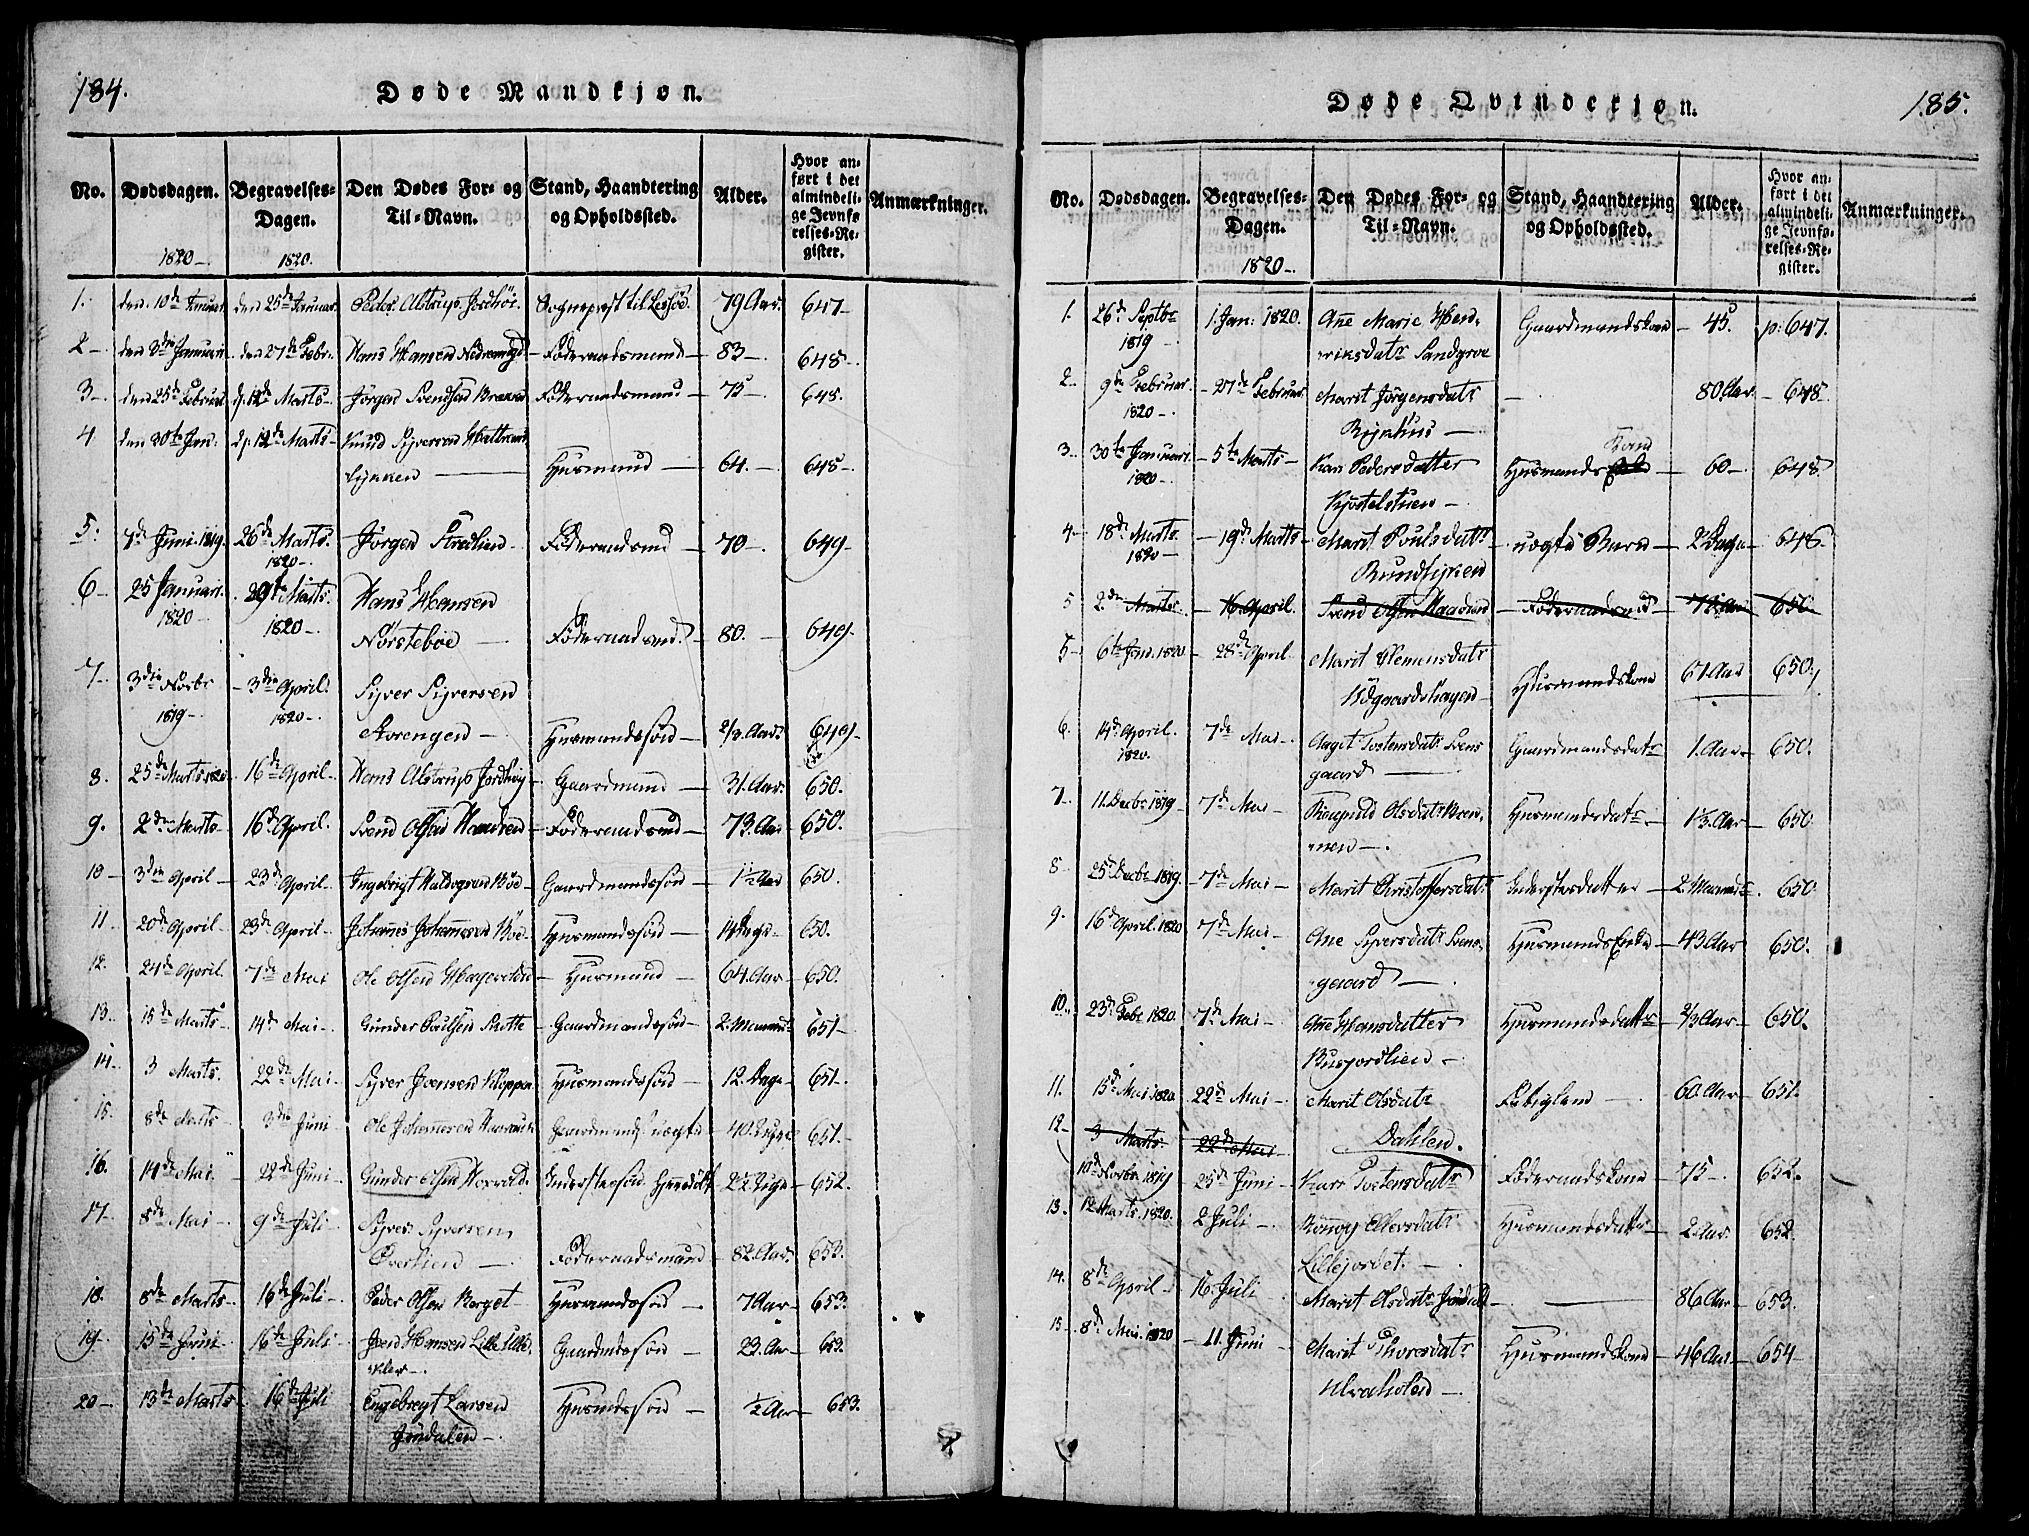 SAH, Lesja prestekontor, Ministerialbok nr. 4, 1820-1829, s. 184-185